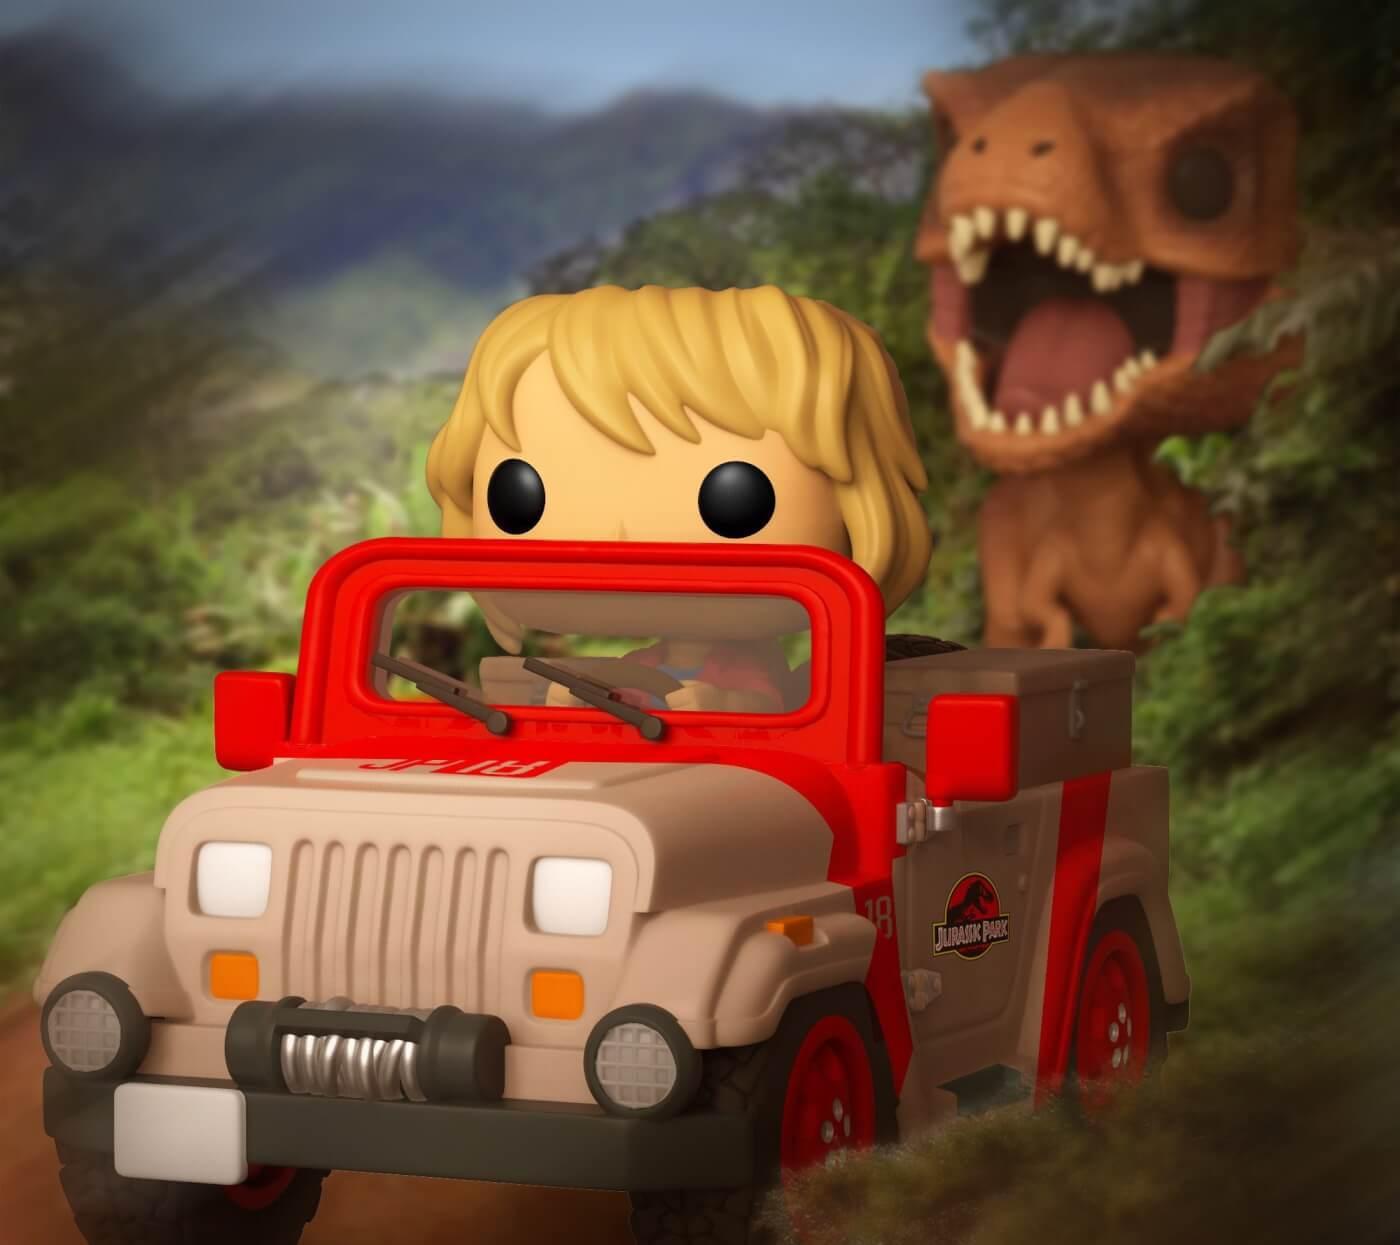 Ellie Sattler is Finally Getting a Jurassic Park Funko Pop (Kinda)!